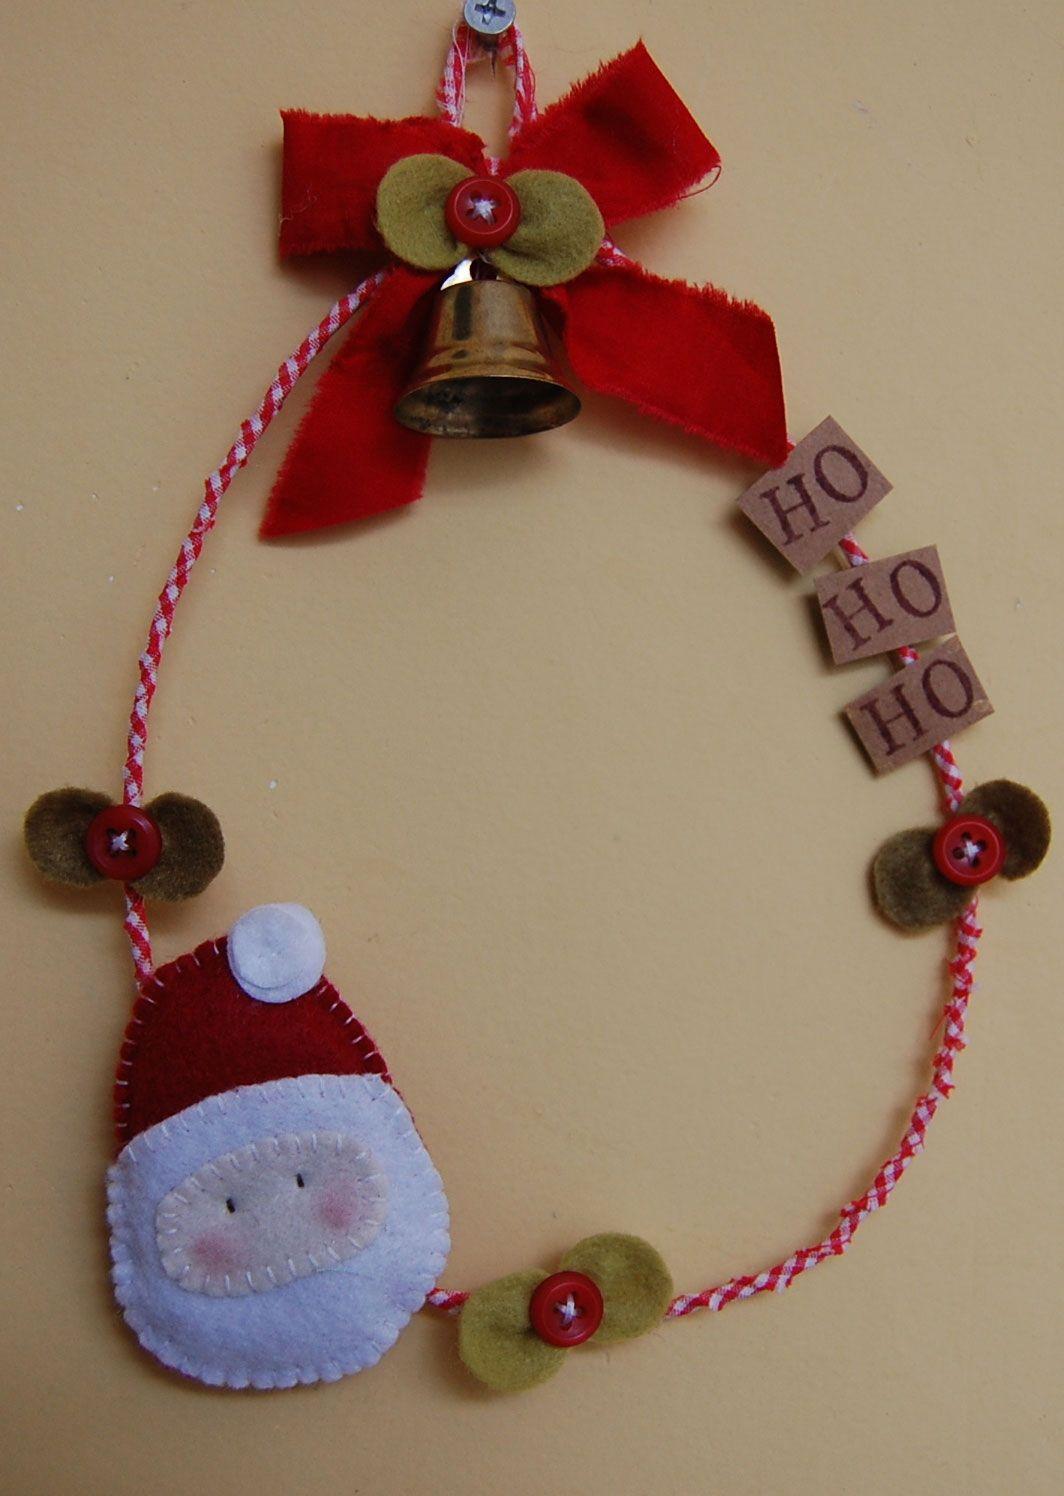 Guirlanda com fita vermelha, sino e Papai Noel de feltro